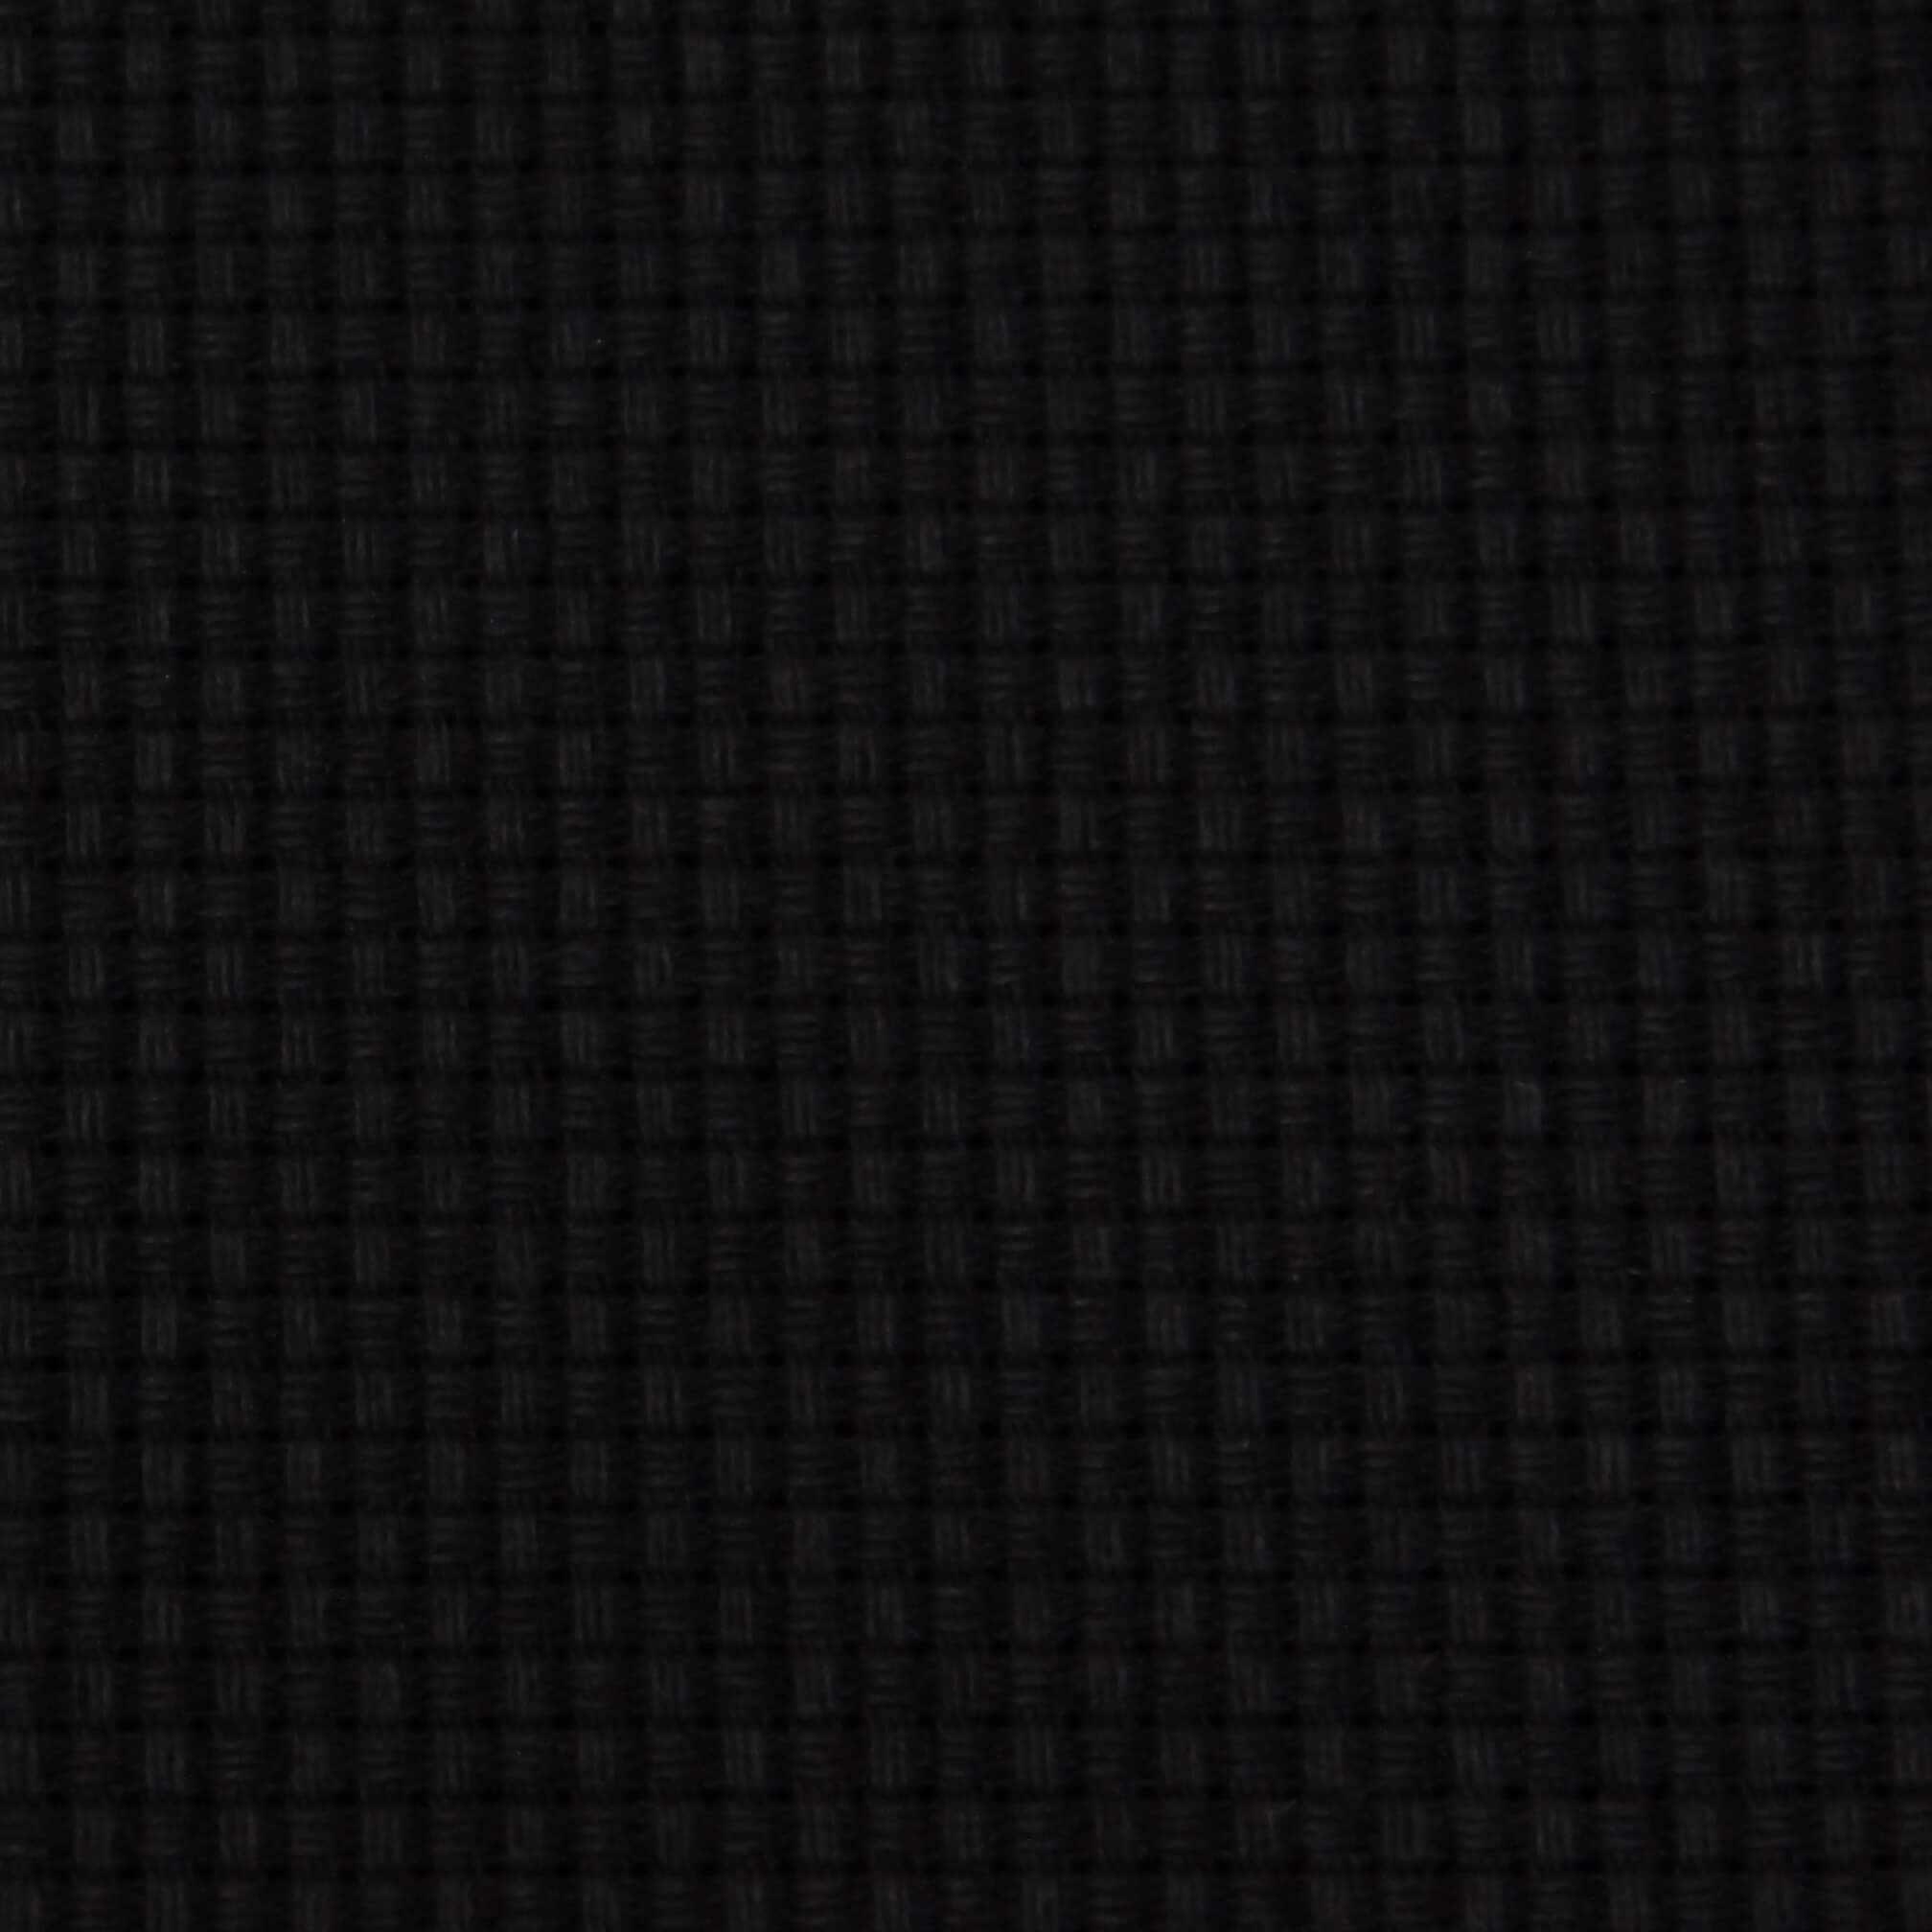 Канва Gamma К03 Аида черный 150*100 11ct 45/10 кл.